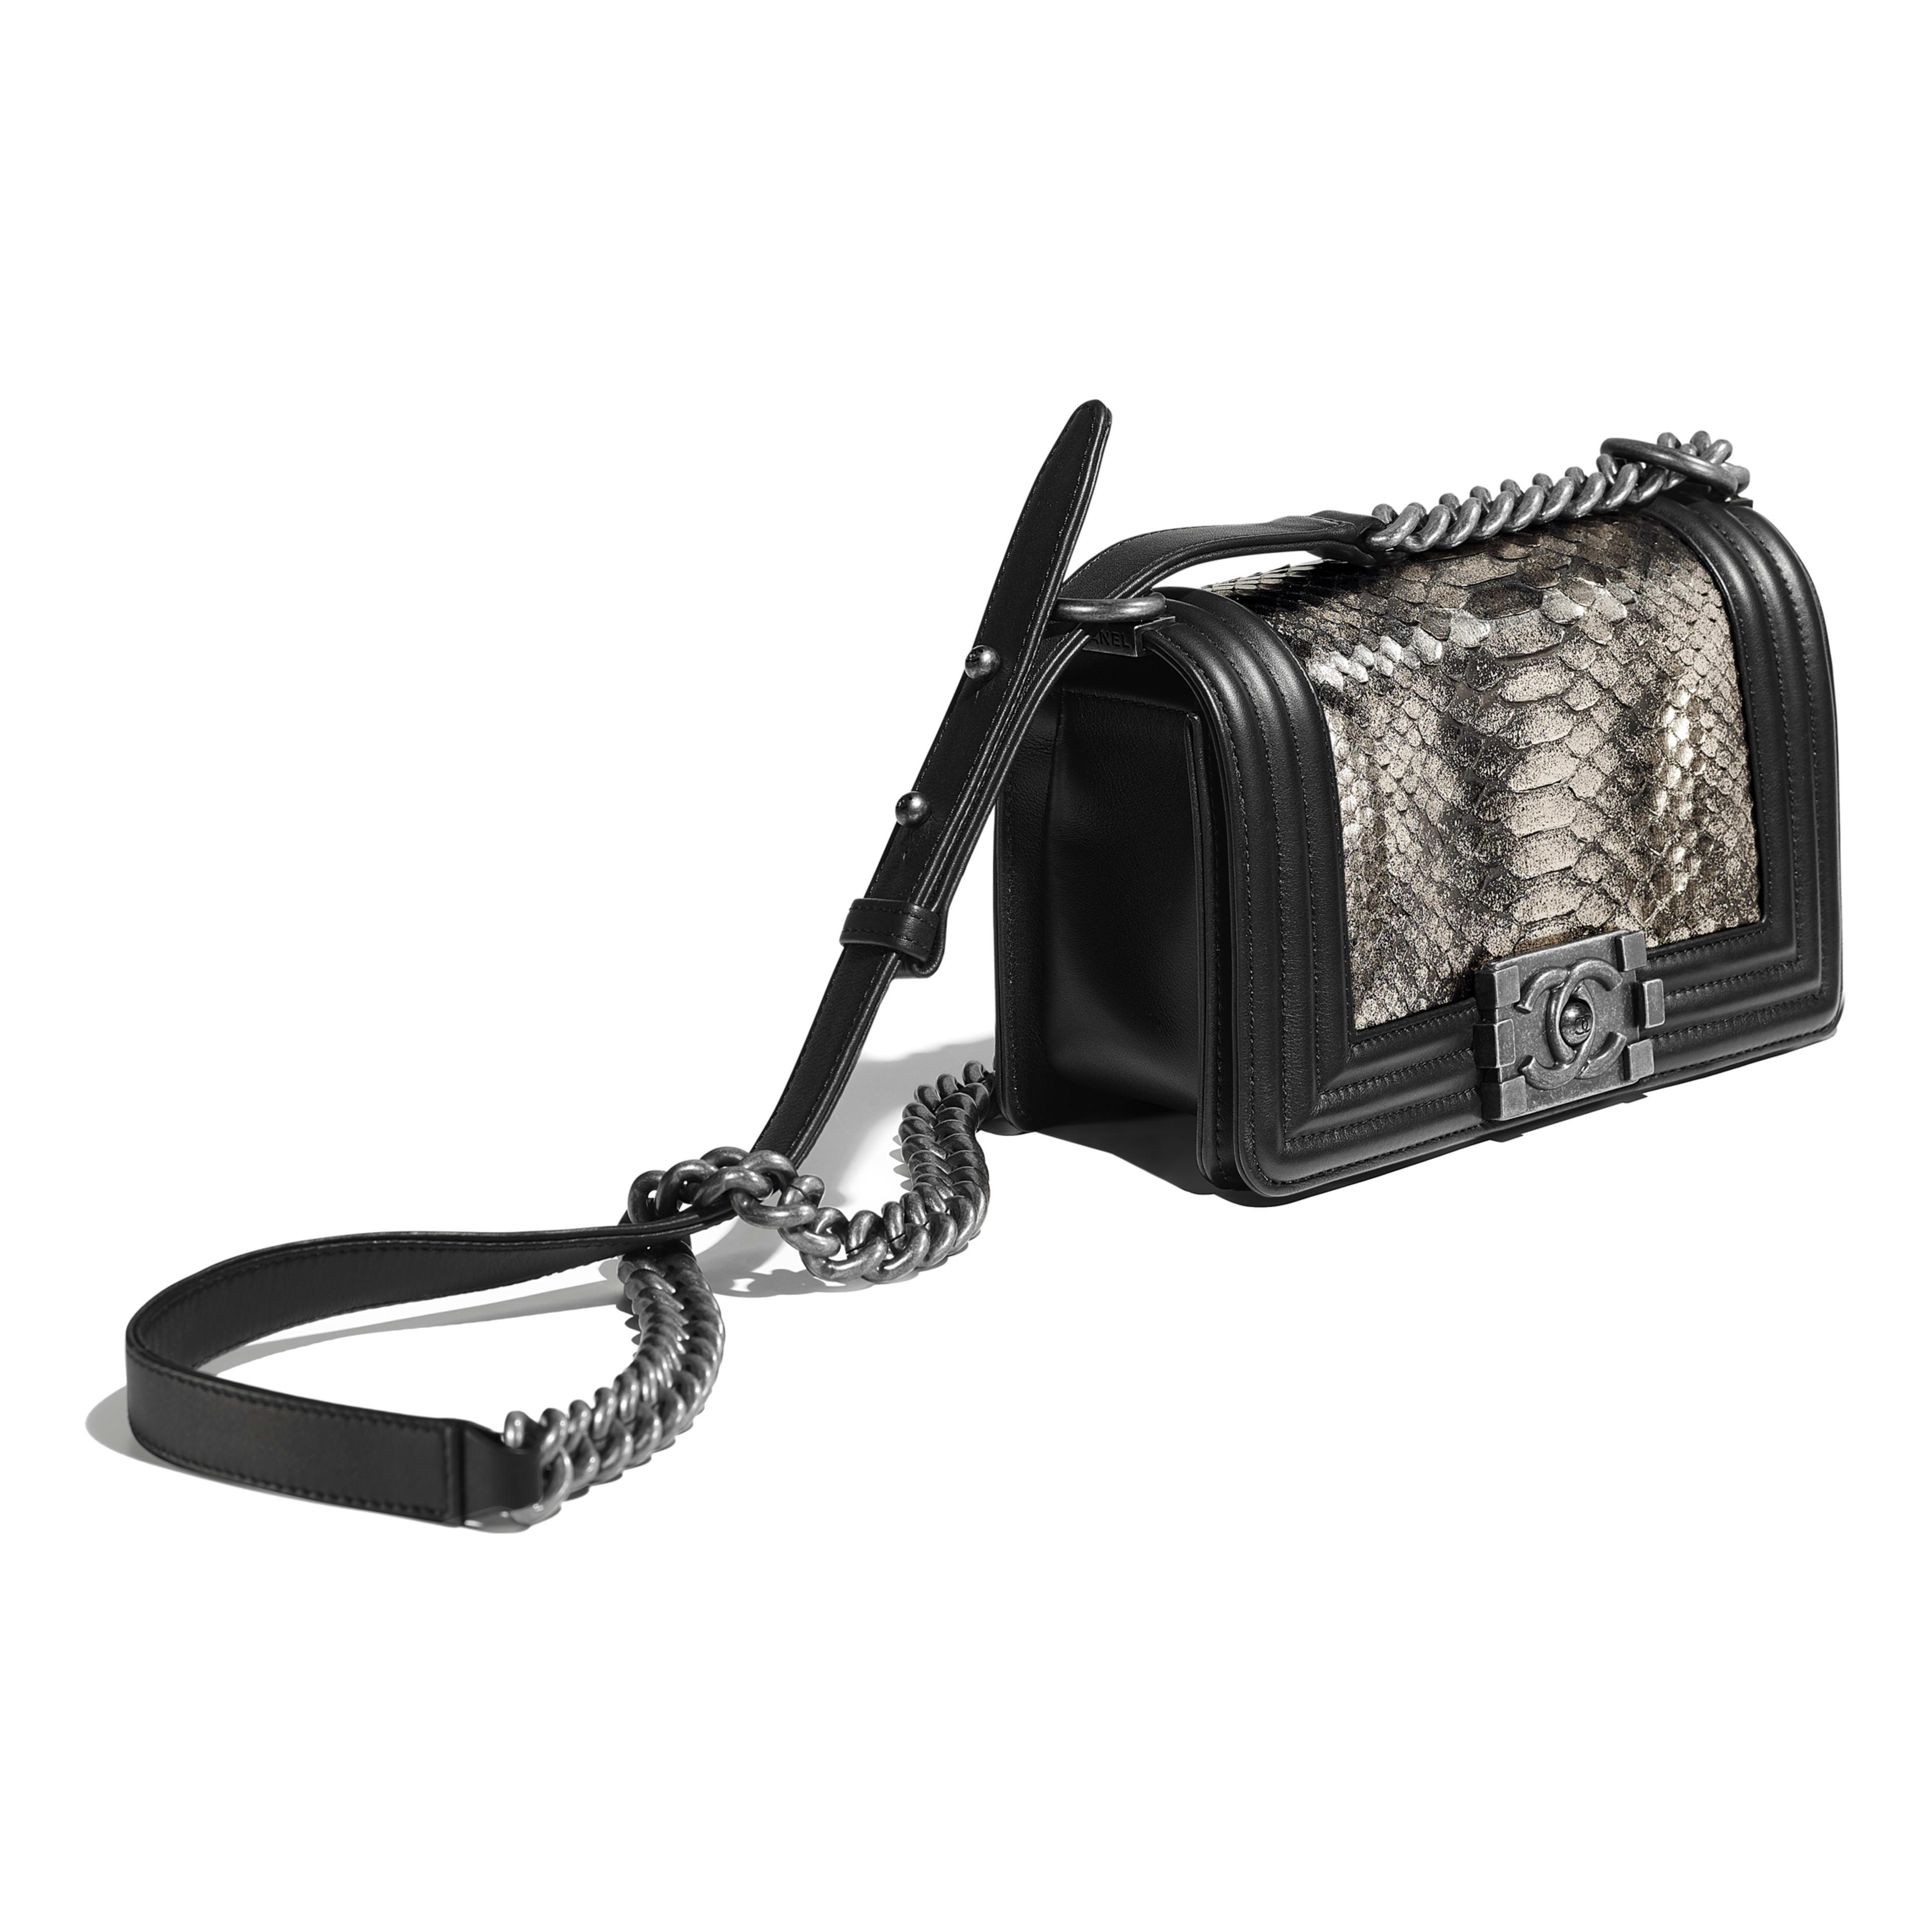 Small BOY CHANEL Handbag - Silver & Black - python, calfskin & ruthenium-finish metal - Other view - see full sized version